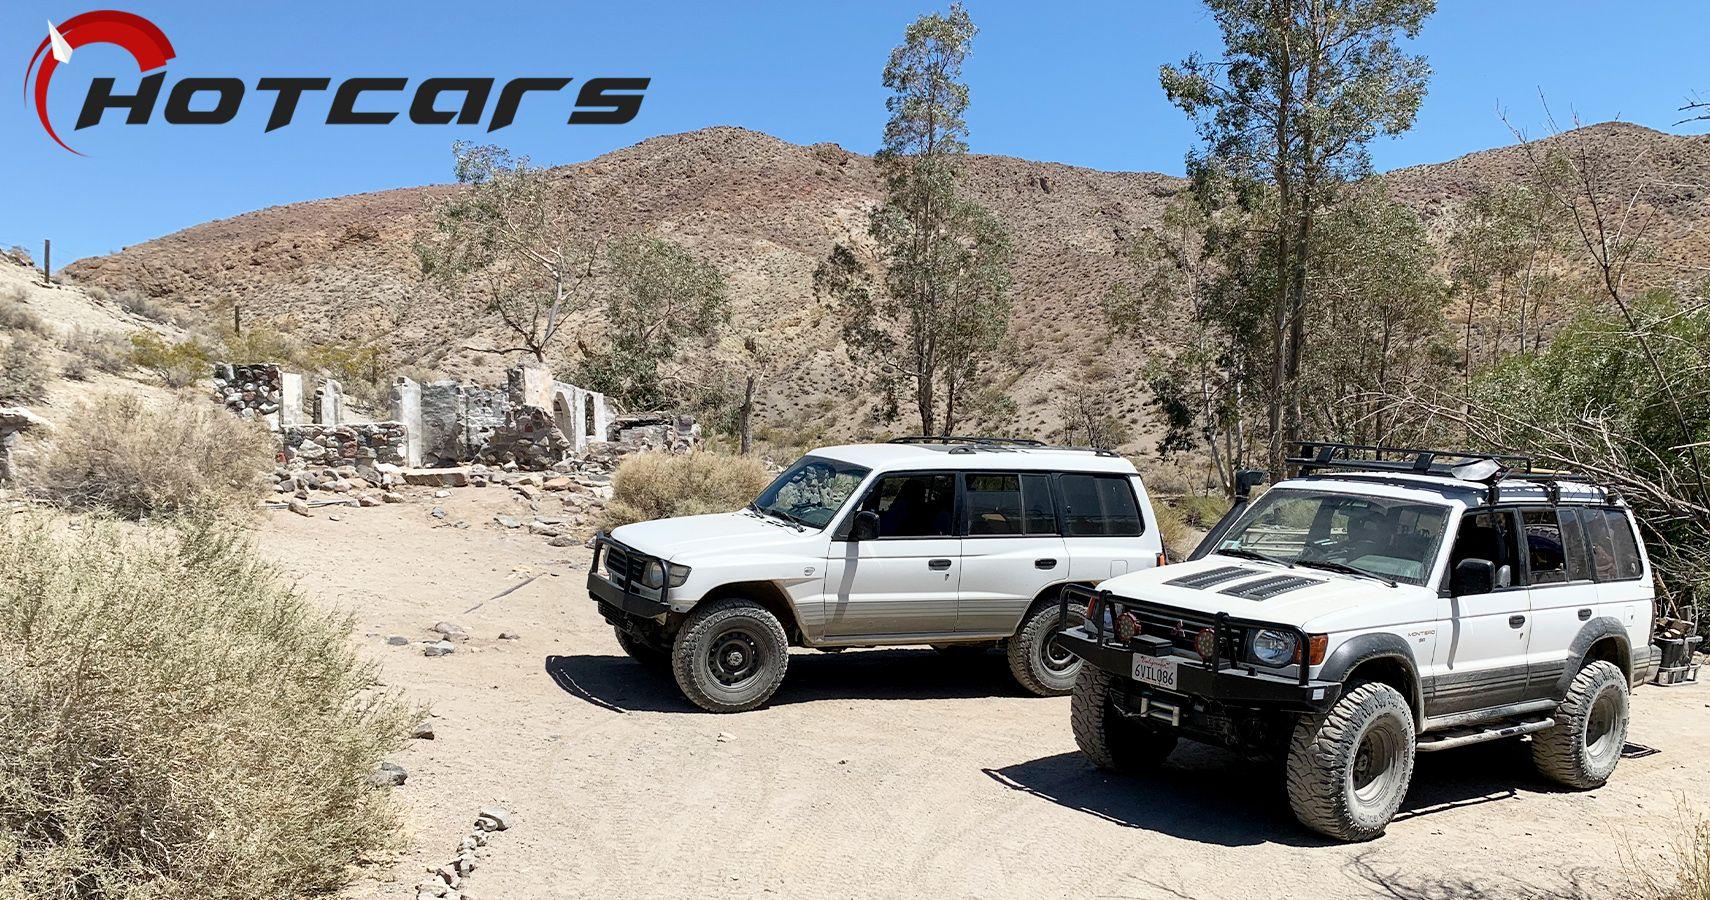 Mitsubishi Monteros Visit The Manson Family Hideout At Barker Ranch